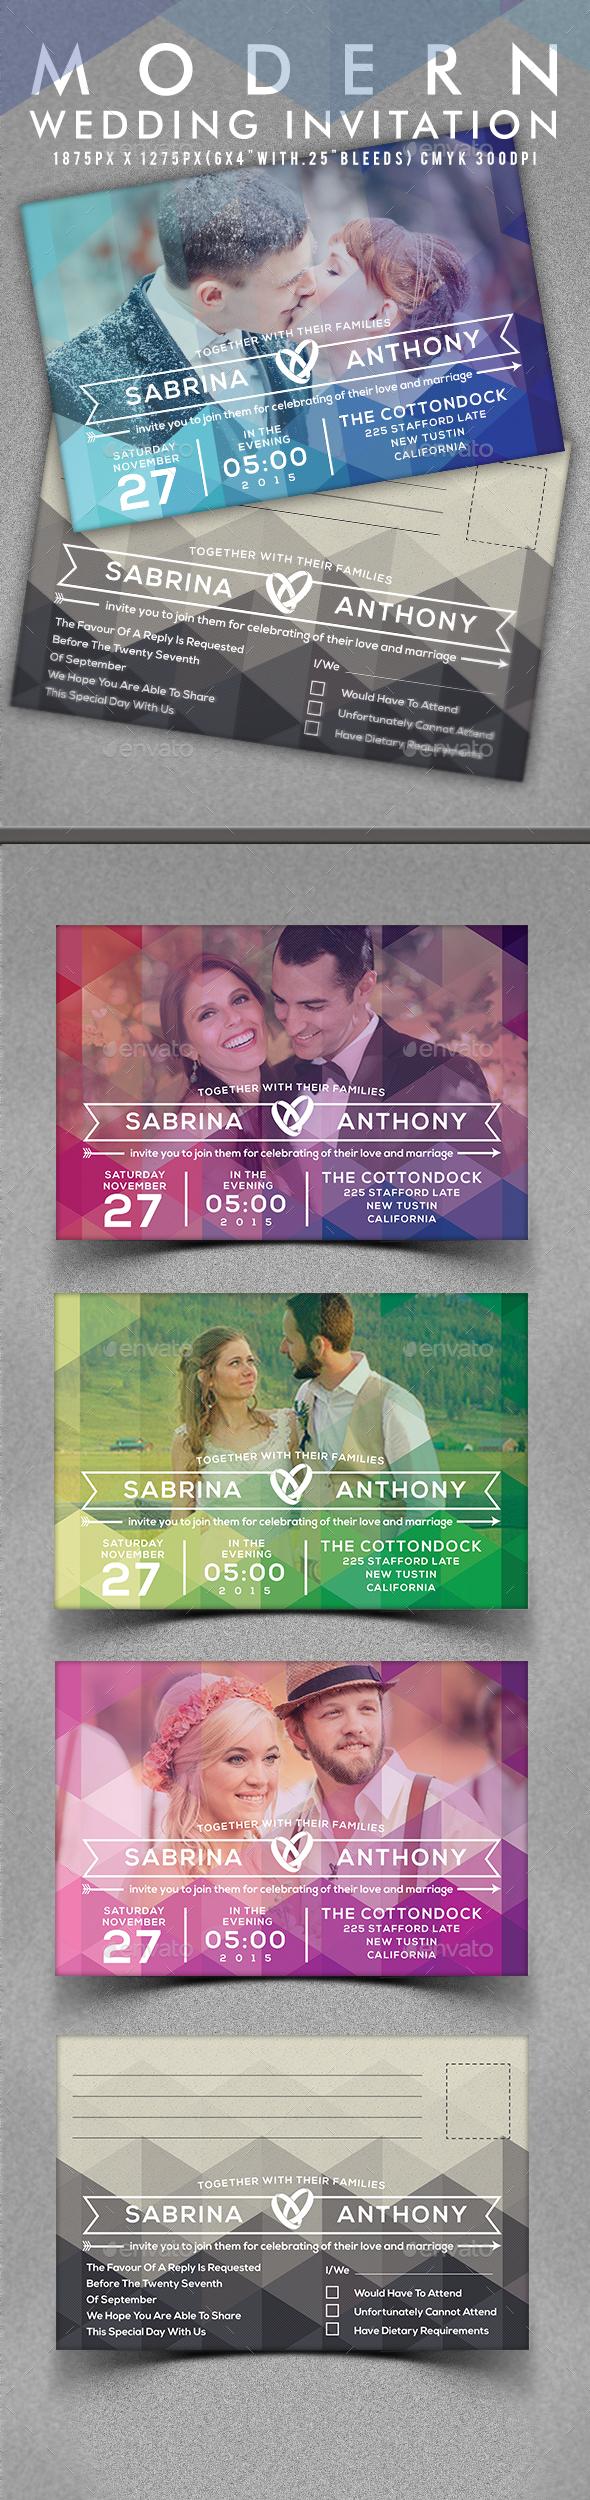 Modern Wedding Invitation - Invitations Cards & Invites